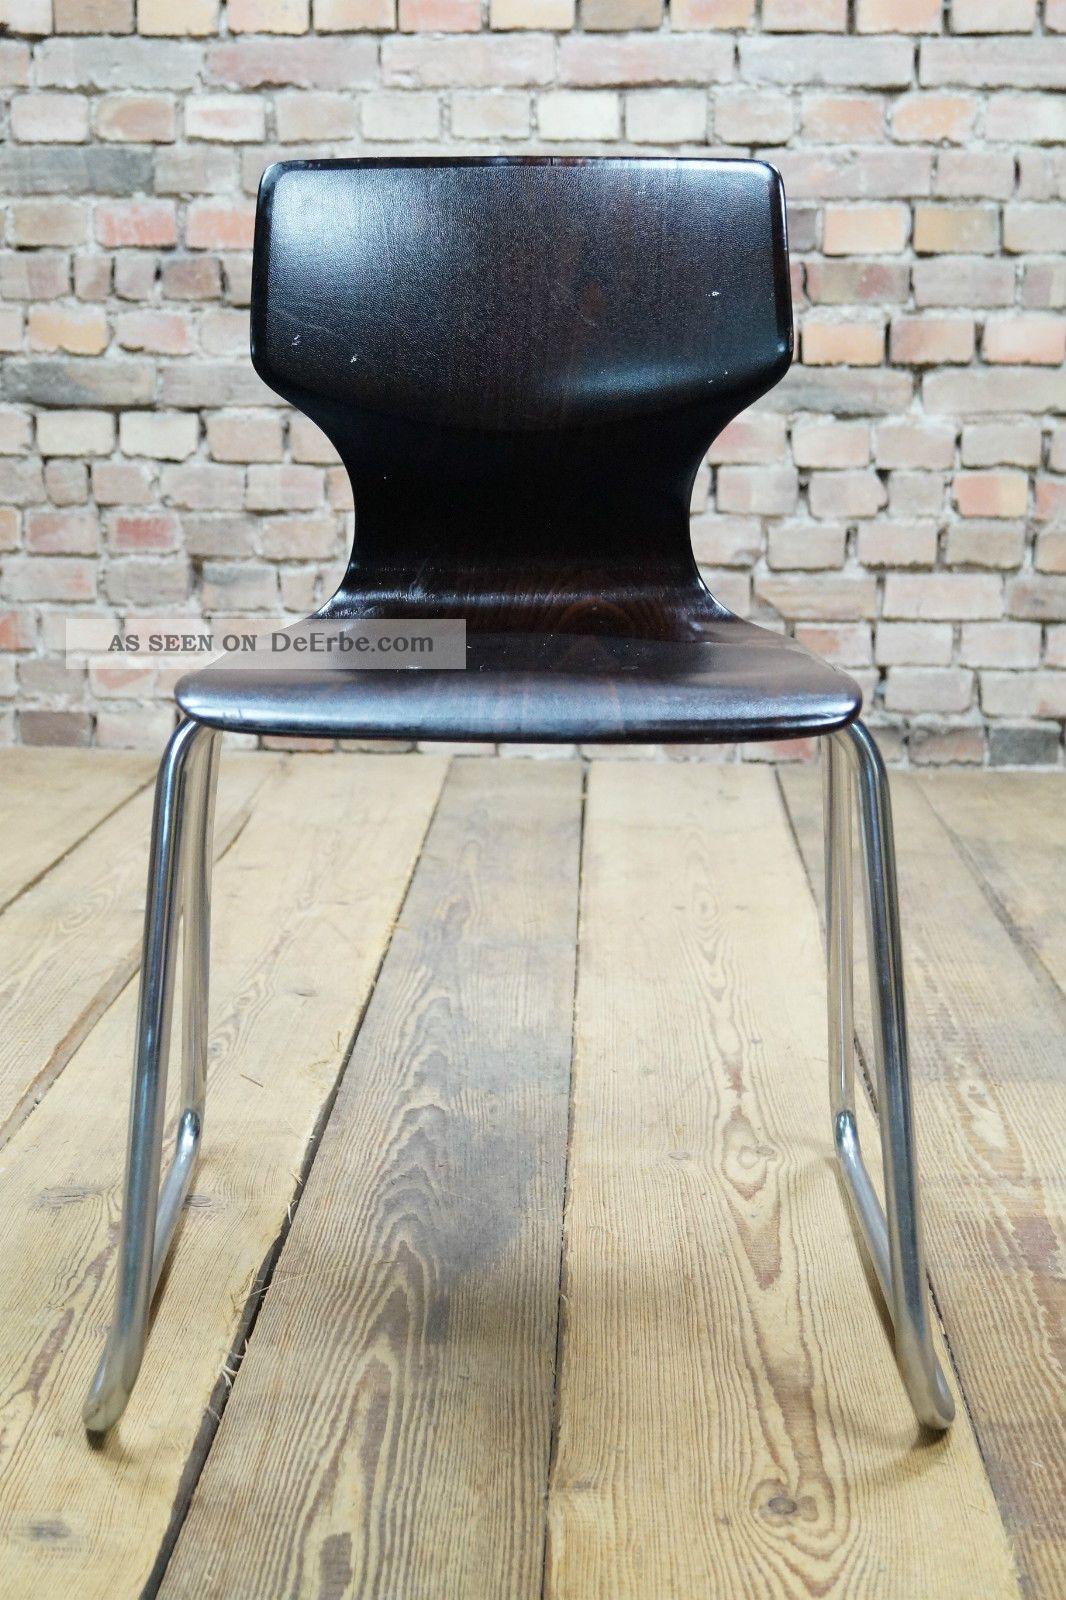 70er fl totto pagholz stuhl chrom pagwood eames panton ra 2. Black Bedroom Furniture Sets. Home Design Ideas